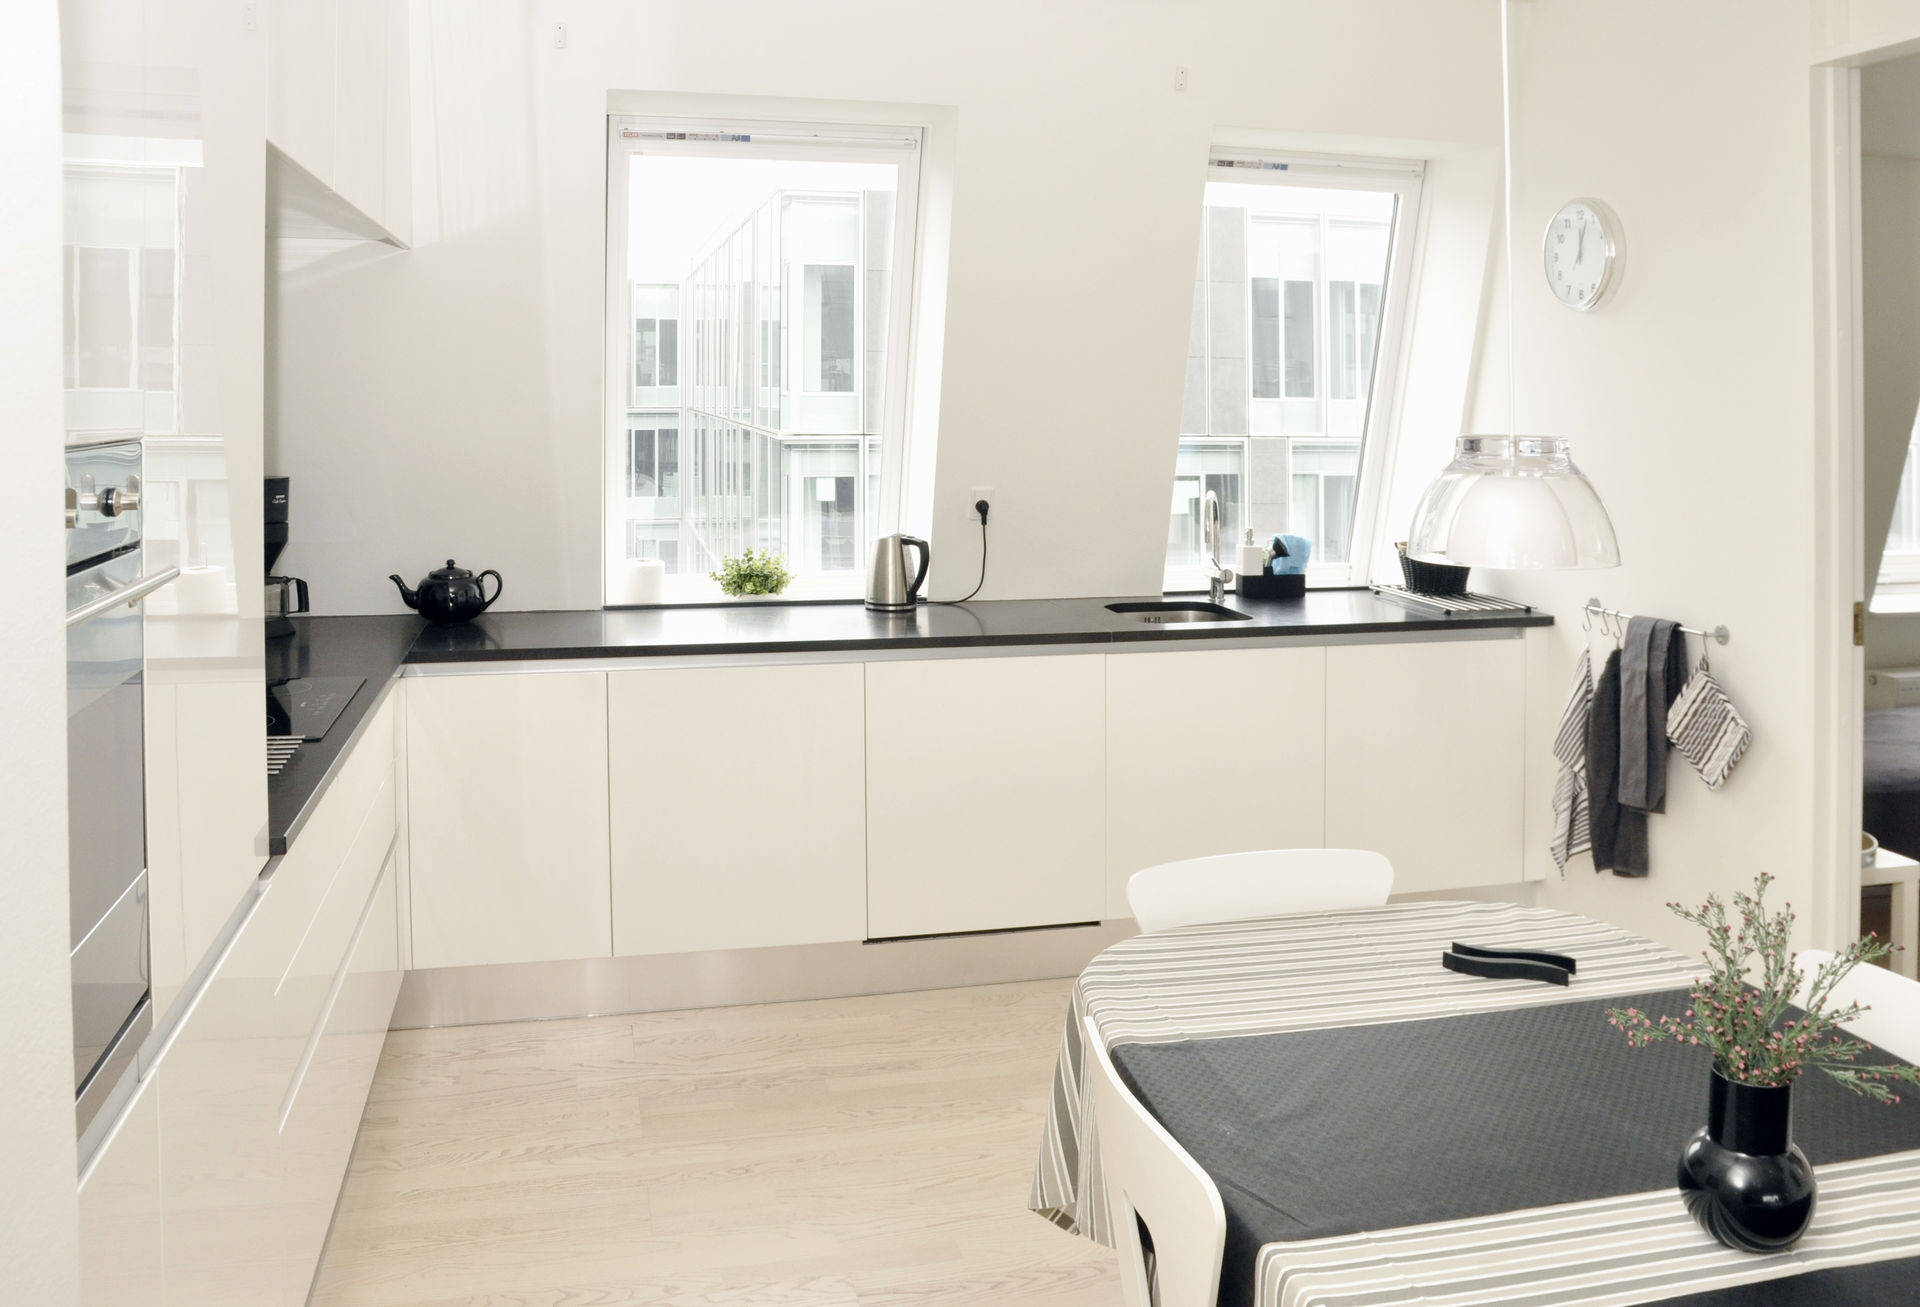 Kopenhagen Wohnung islands brygge to water wohnung in kopenhagen